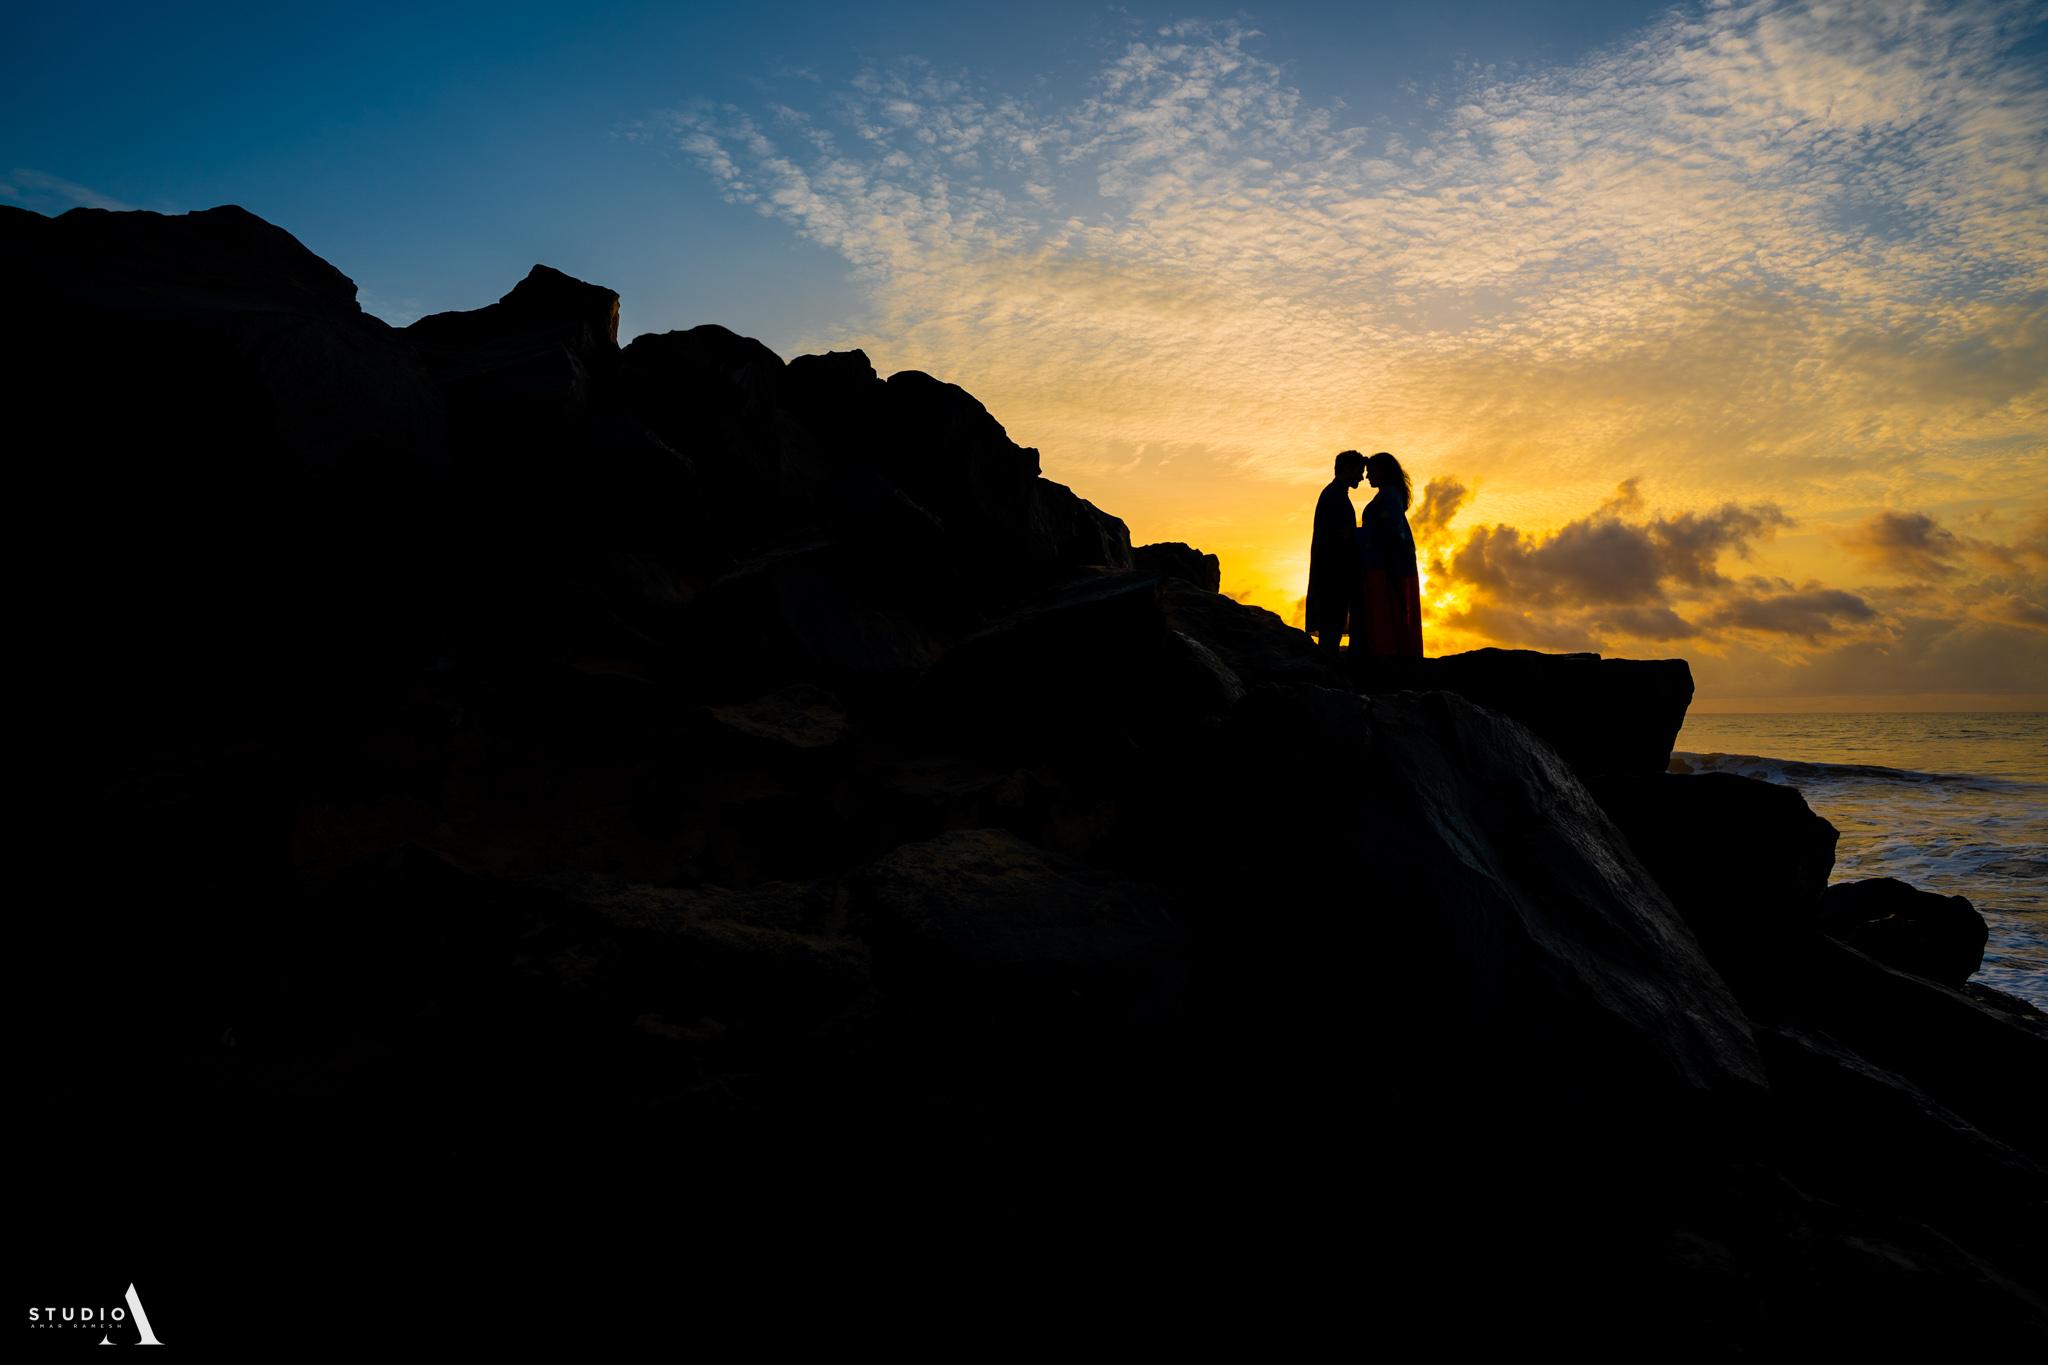 Studio-a-wedding-photographer-lakshman-3